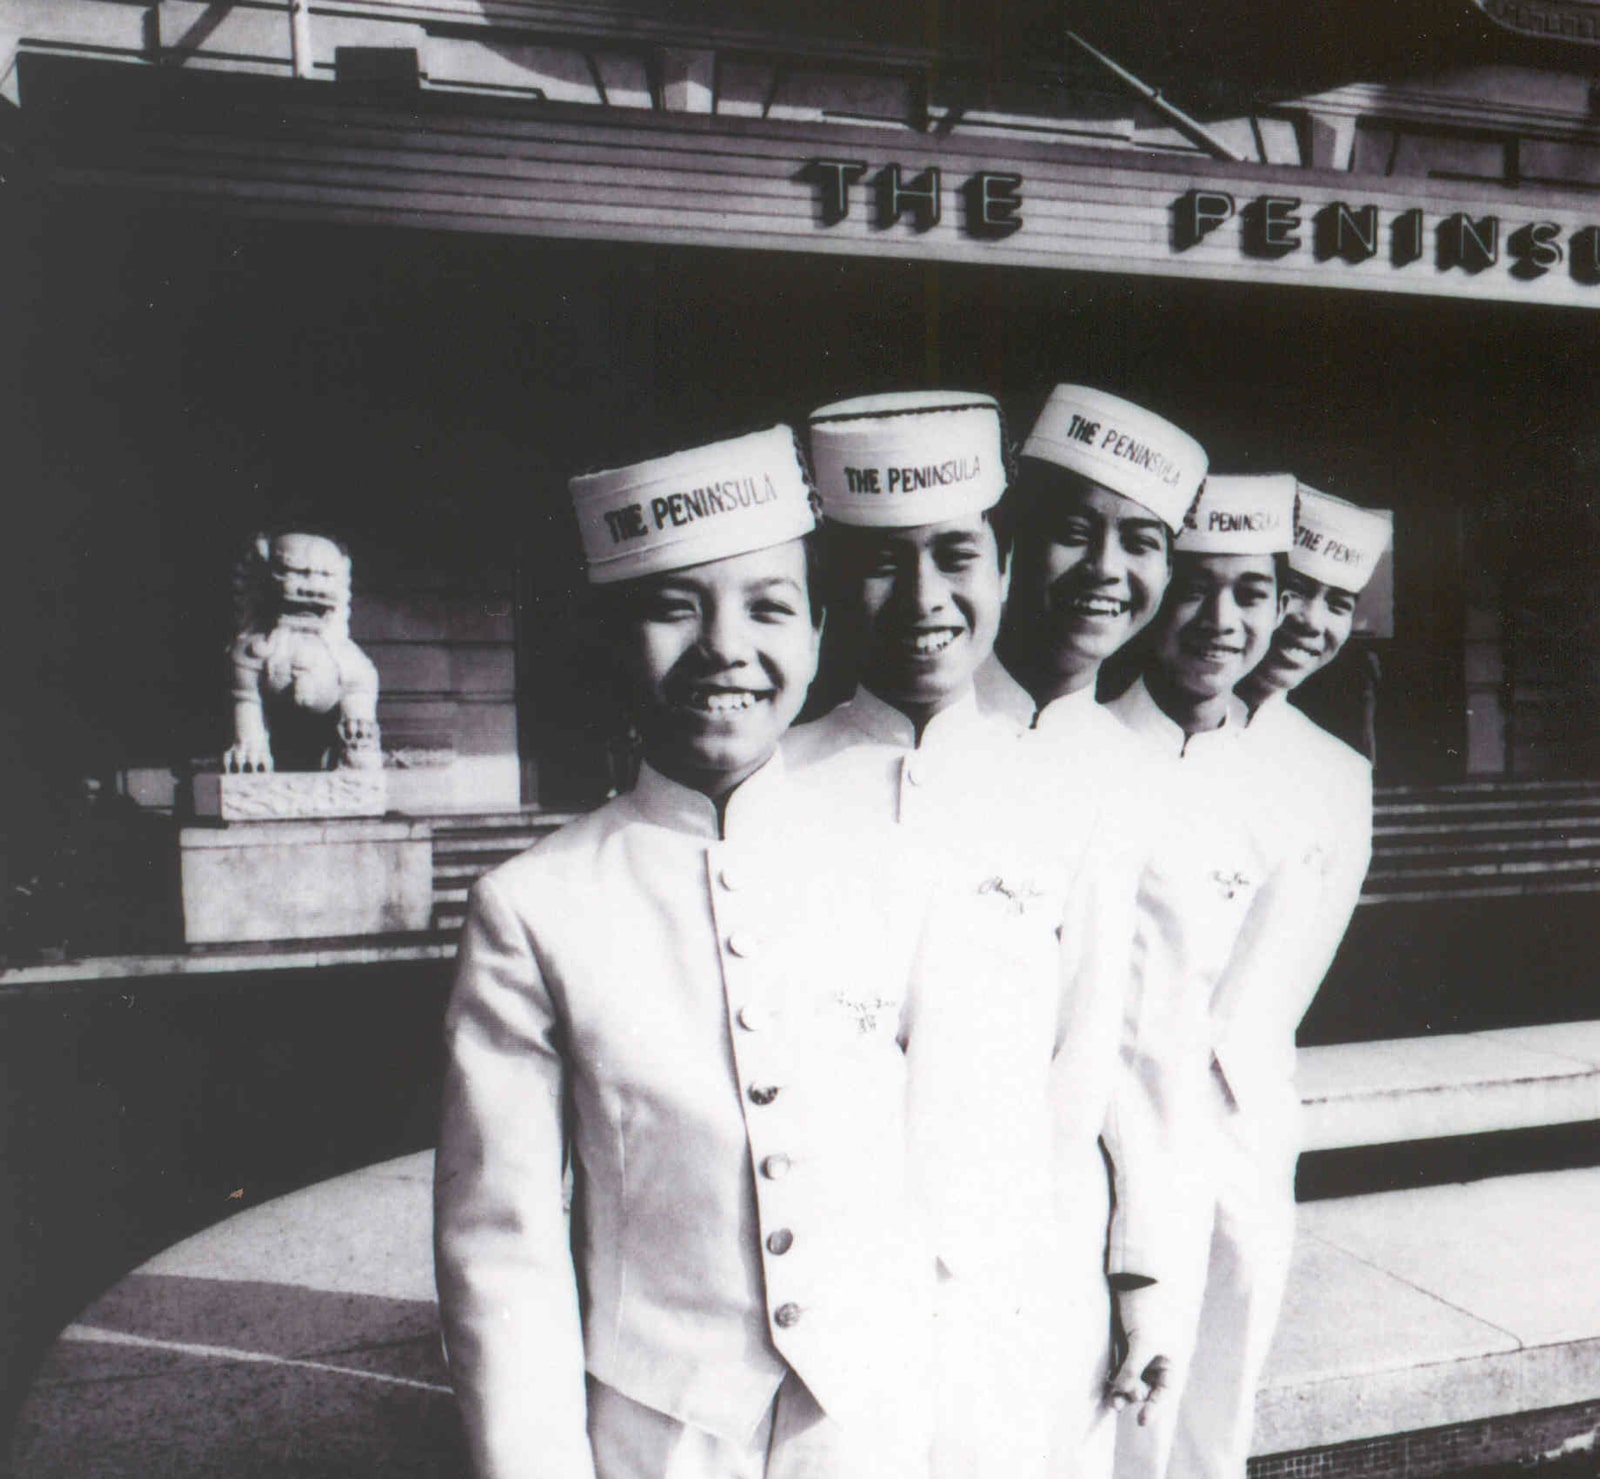 1950s Pageboys representing The Peninsula brand